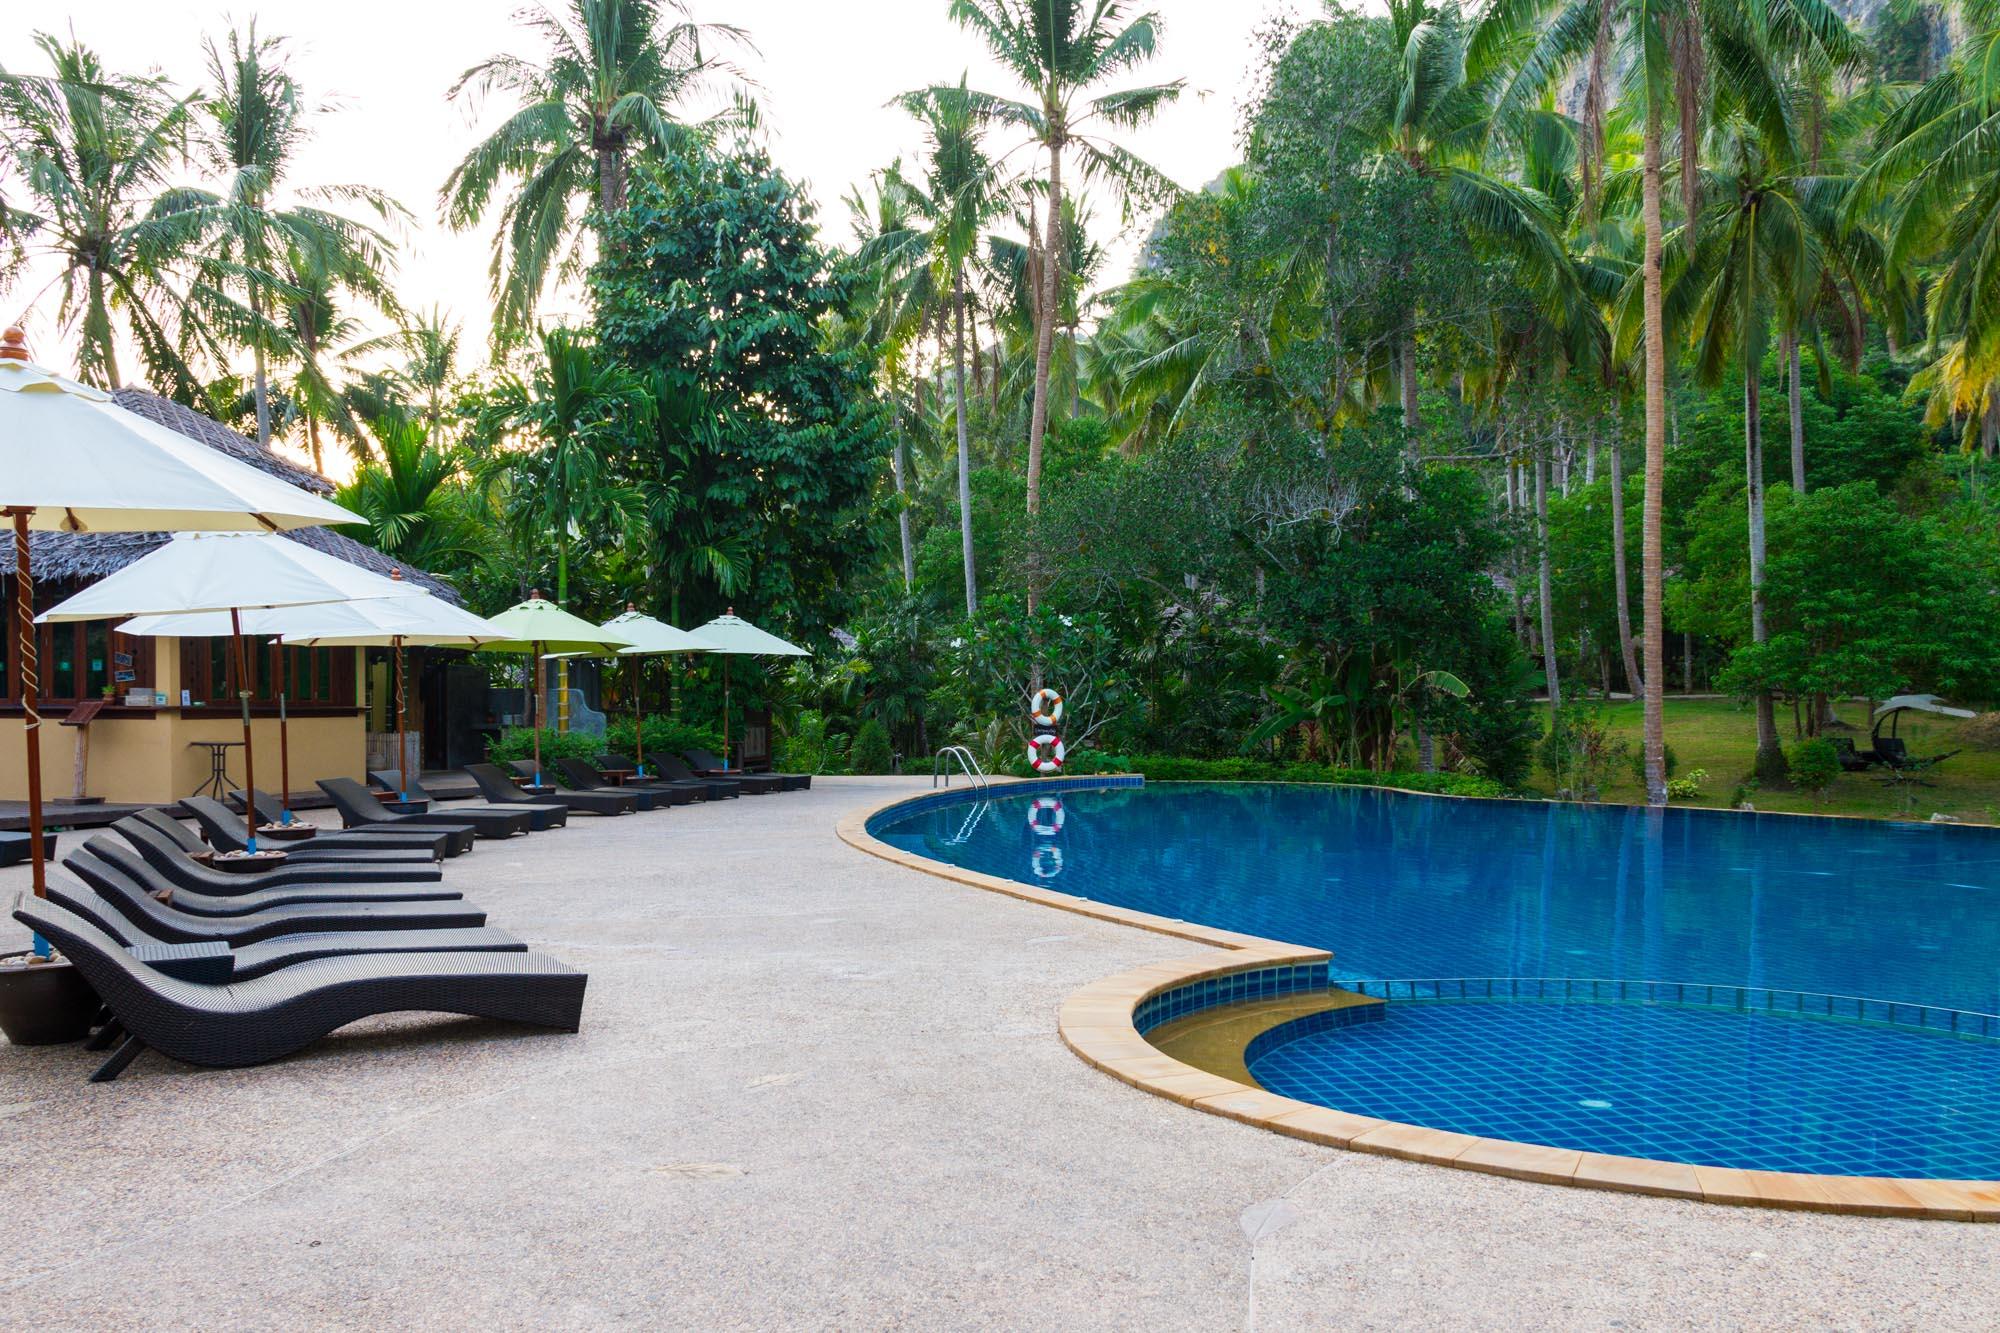 Ban Sainai Resort, Ao Nang Beach  บ้านใสใน รีสอร์ท Ban Sainai Resort อ่าวนาง กระบี่ IMG 0298